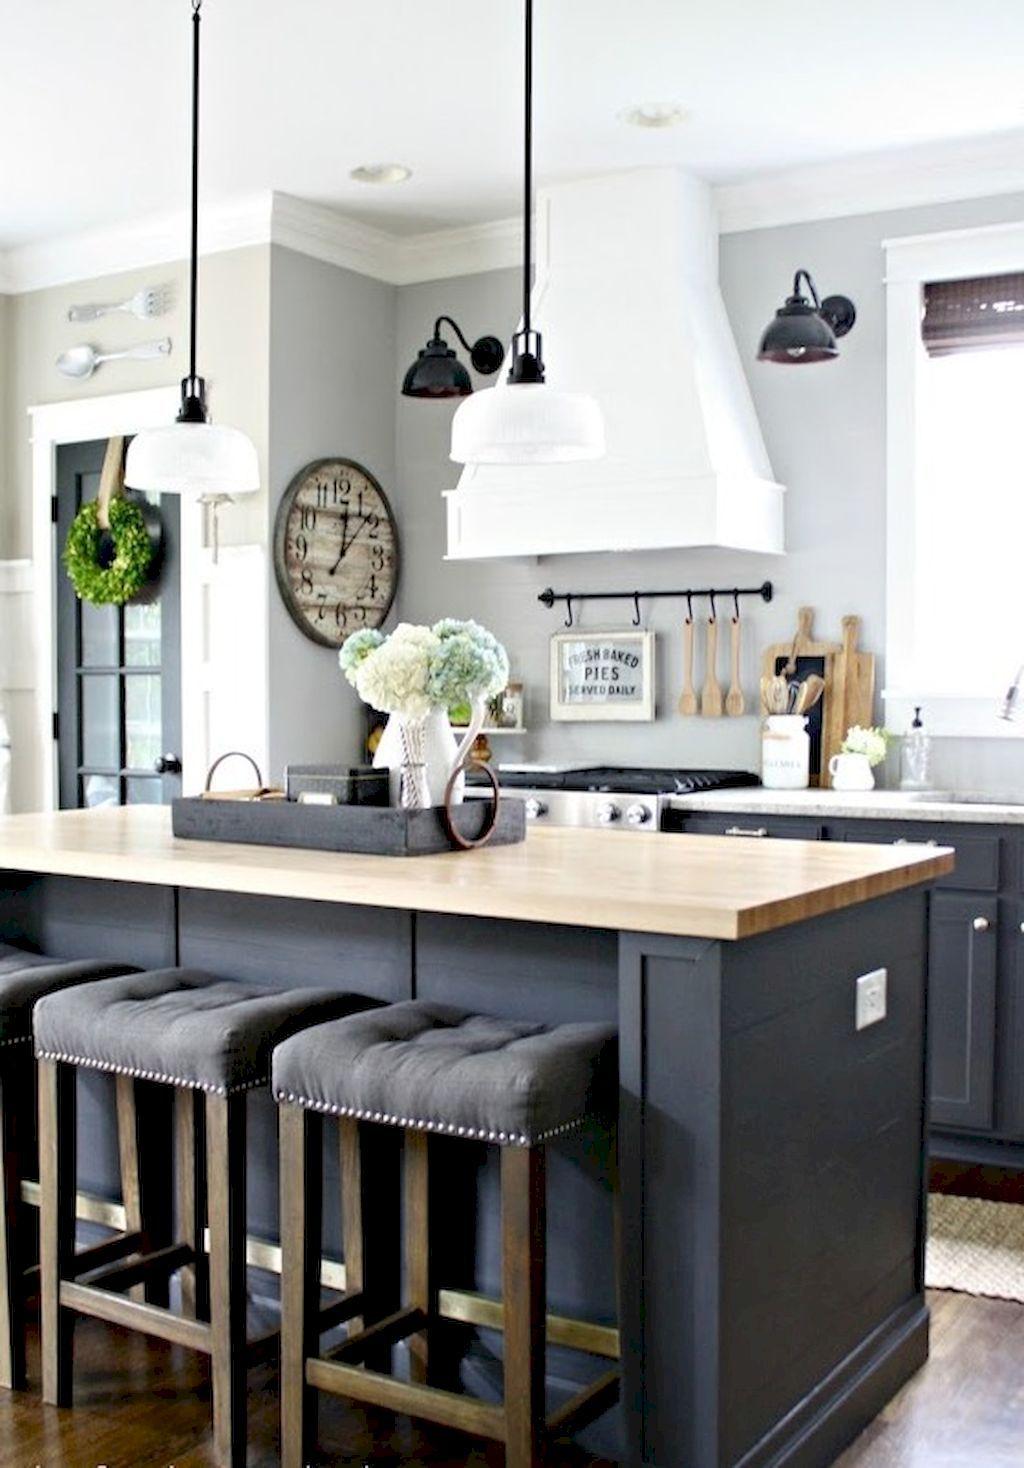 107 incredible farmhouse gray kitchen cabinet design ideas kitchen cabinets decor two tone on farmhouse kitchen grey cabinets id=65163